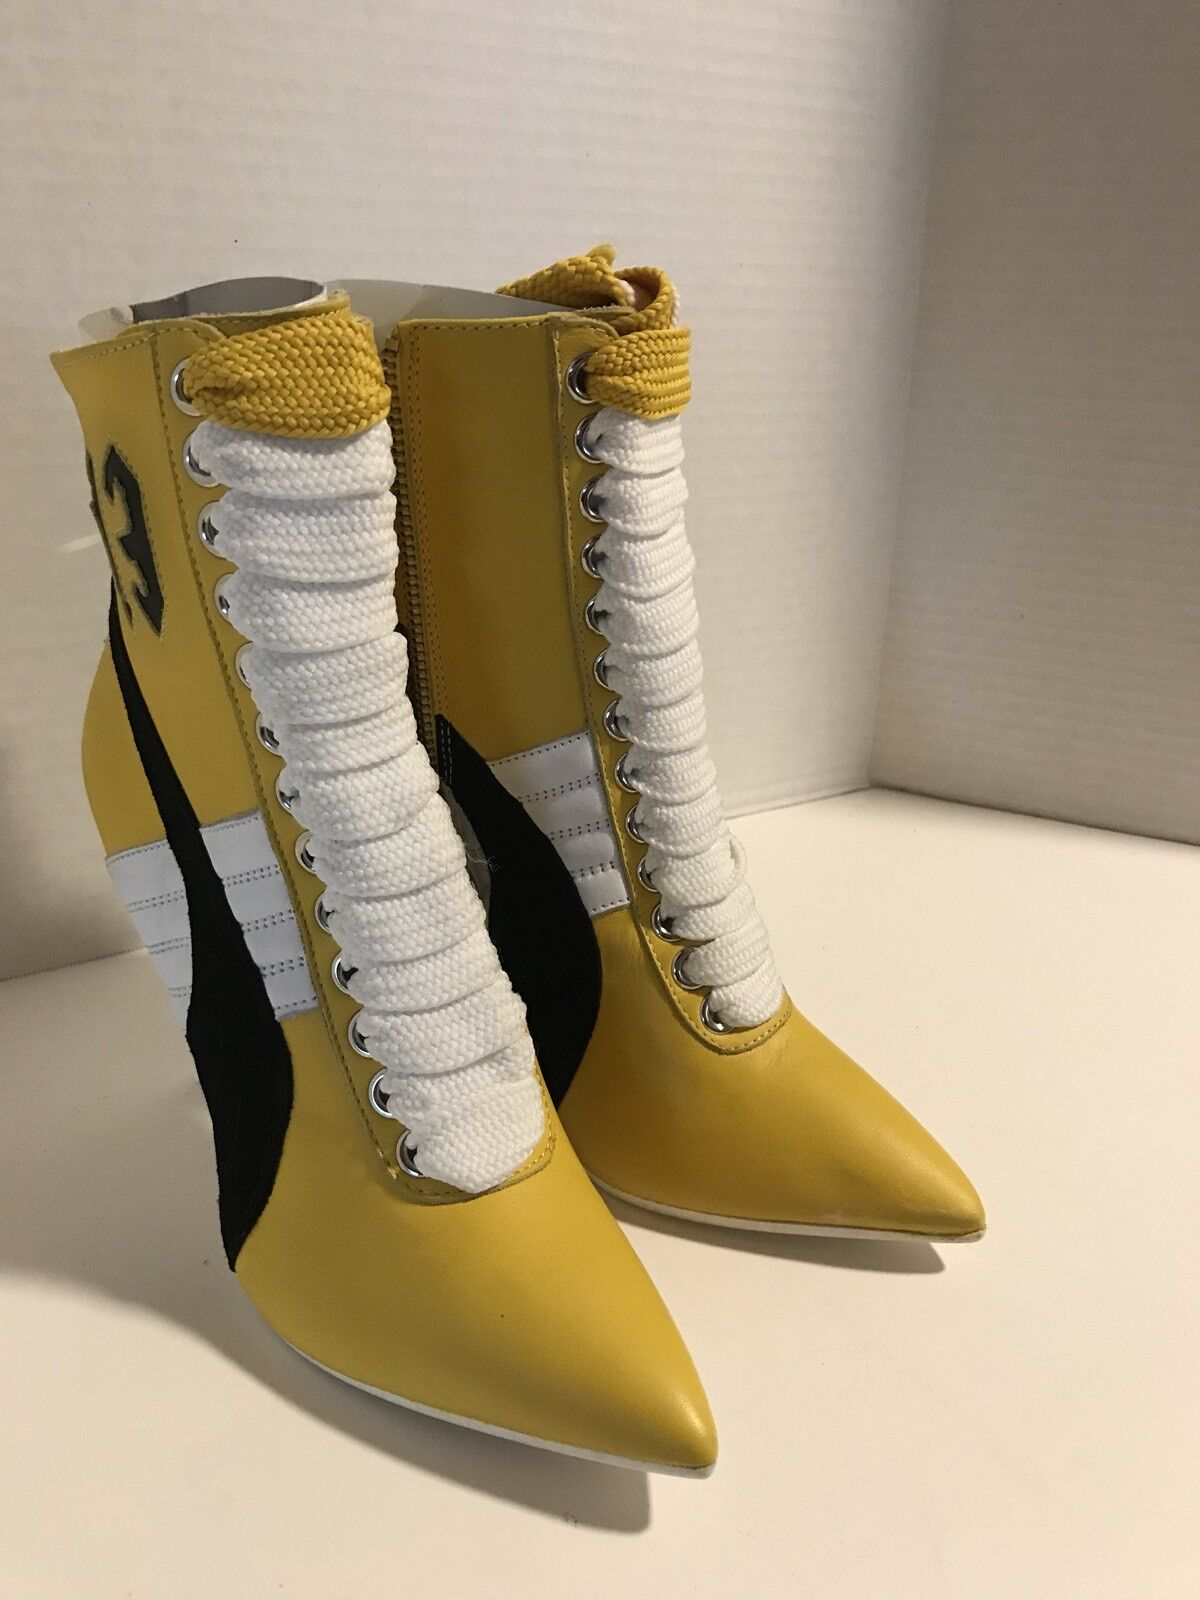 Puma Fenty By Rihanna  Brand Luxury Yellow Boot  (SIZE 6)